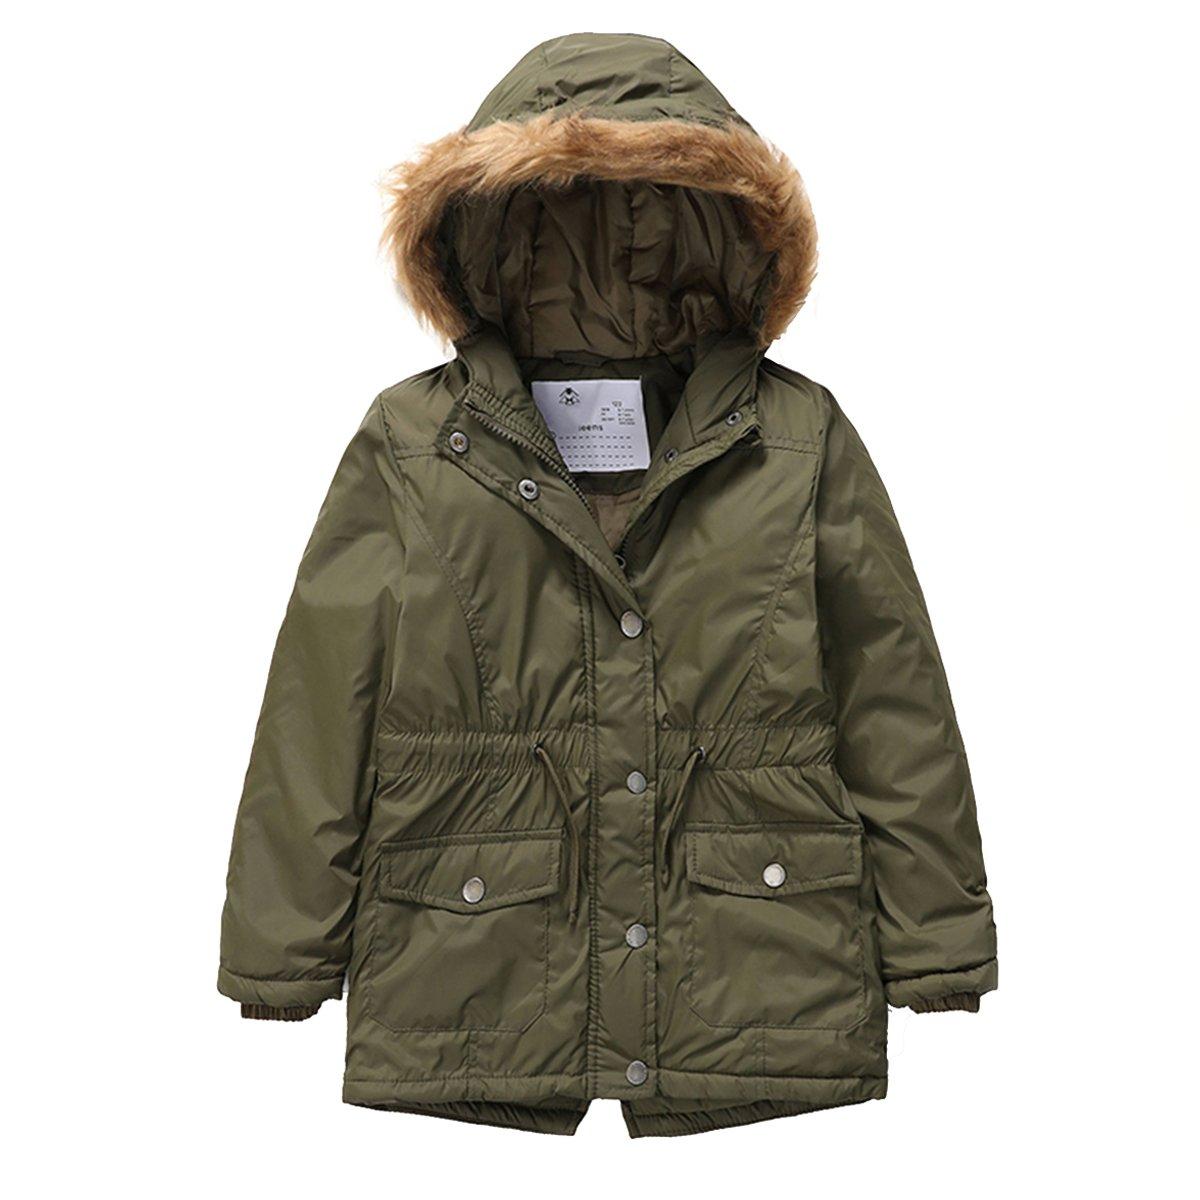 PHIBEE Girls' Cotton Winter Windproof Faux Fur Hooded Parka Jacket Army Green 12